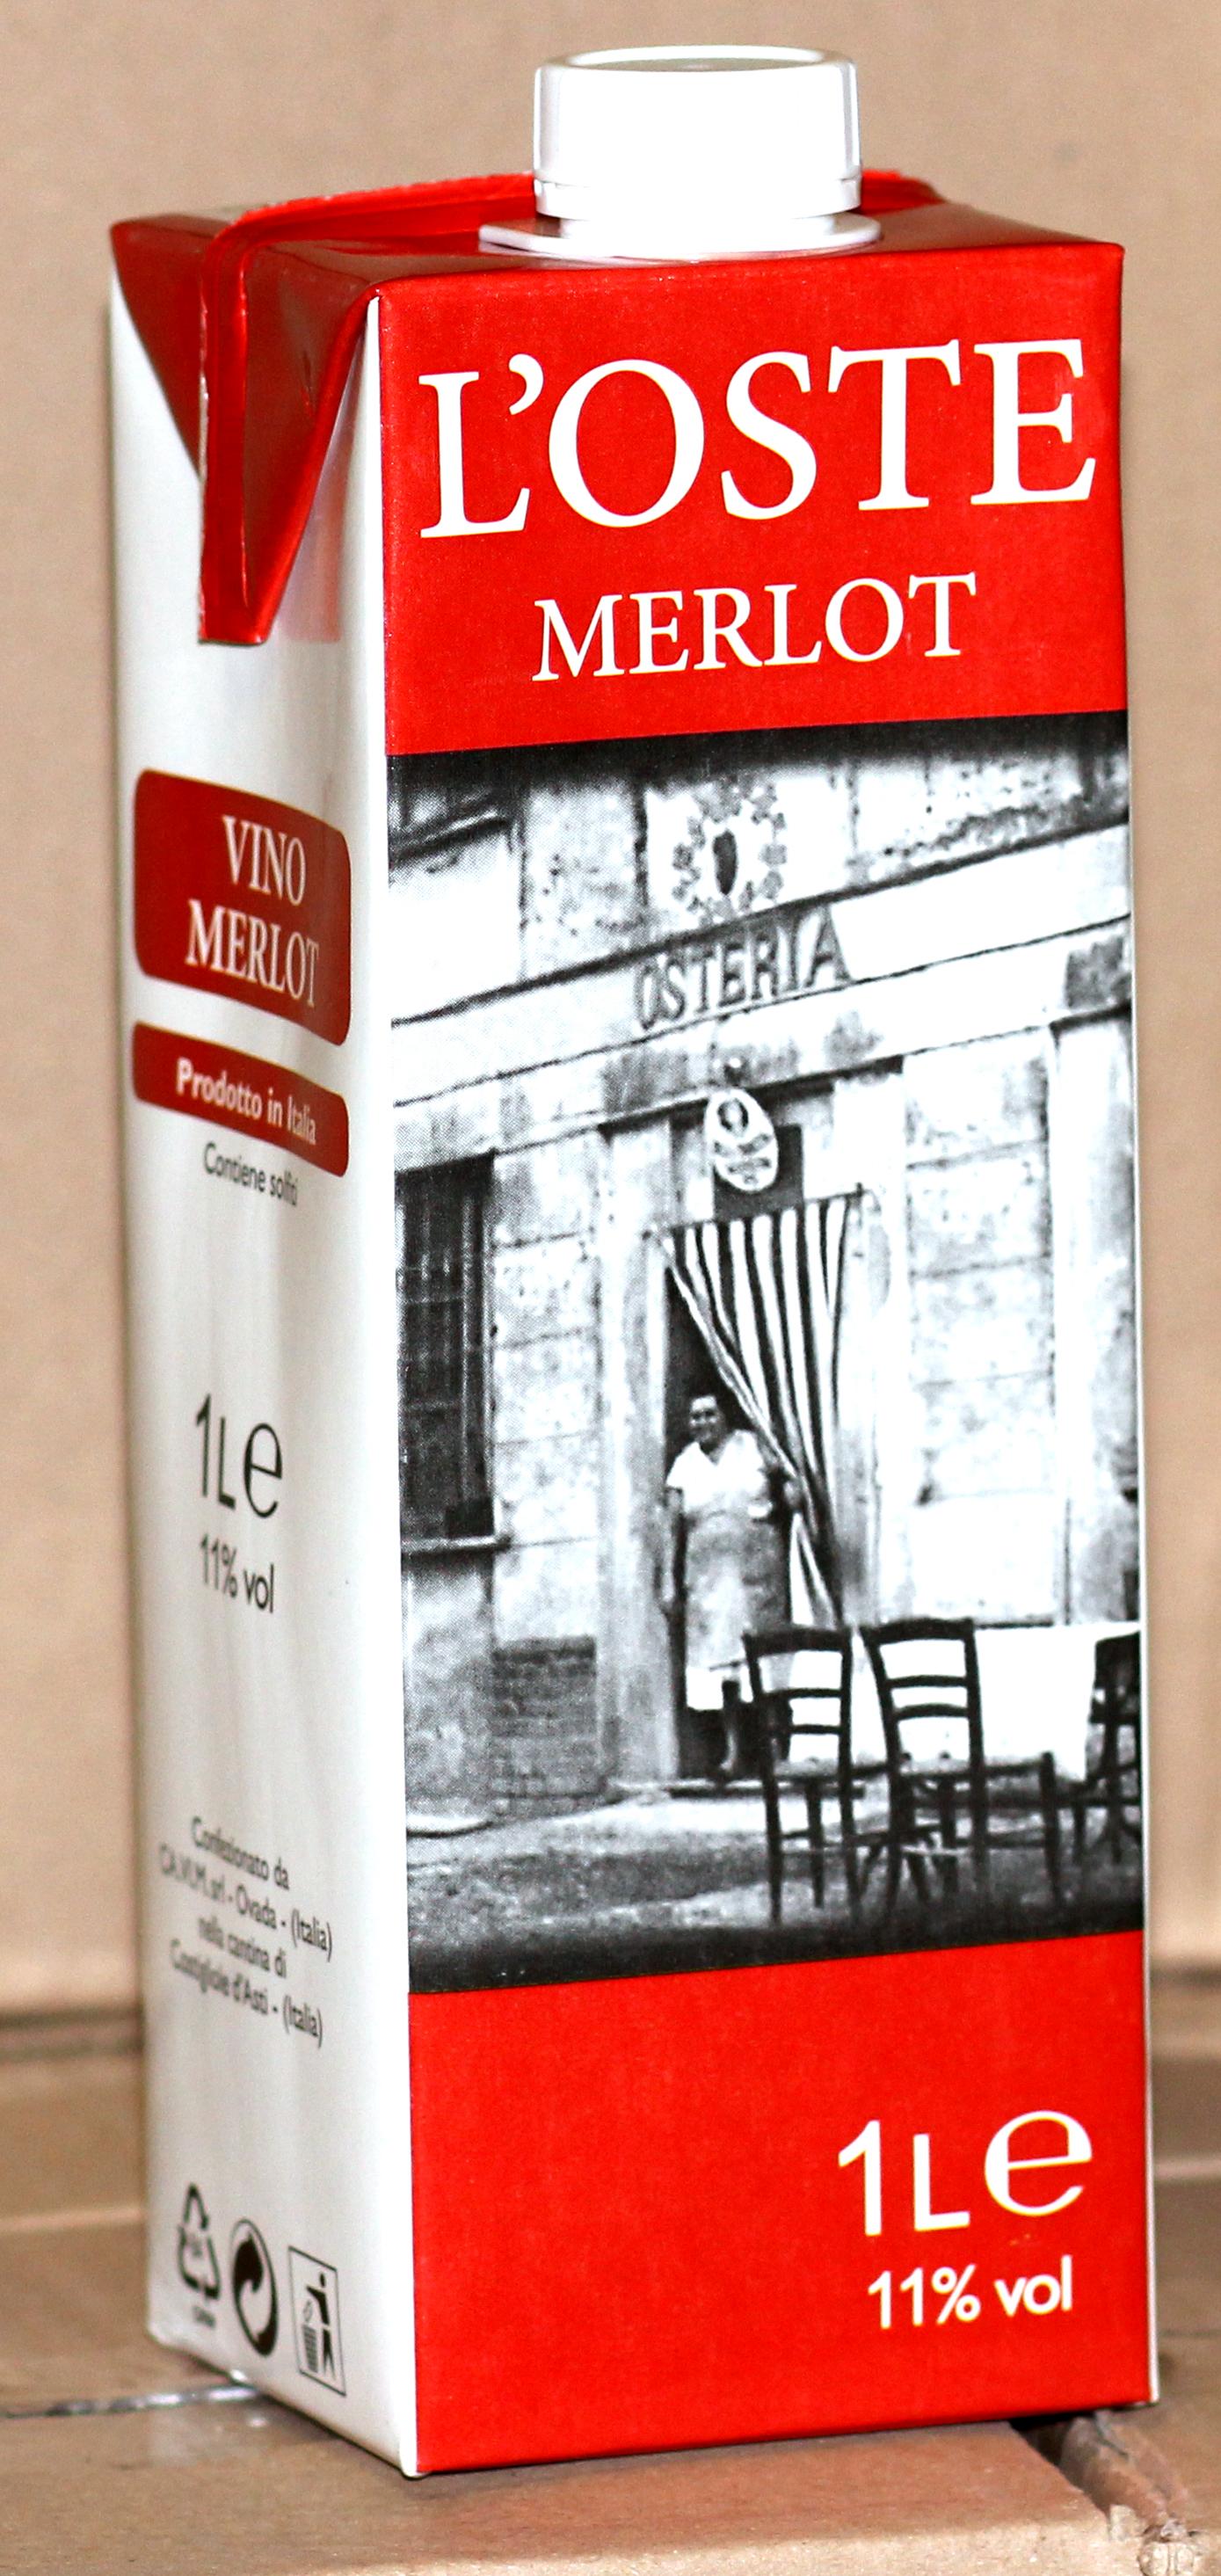 Vino in Brik Rosso Merlot L'Oste